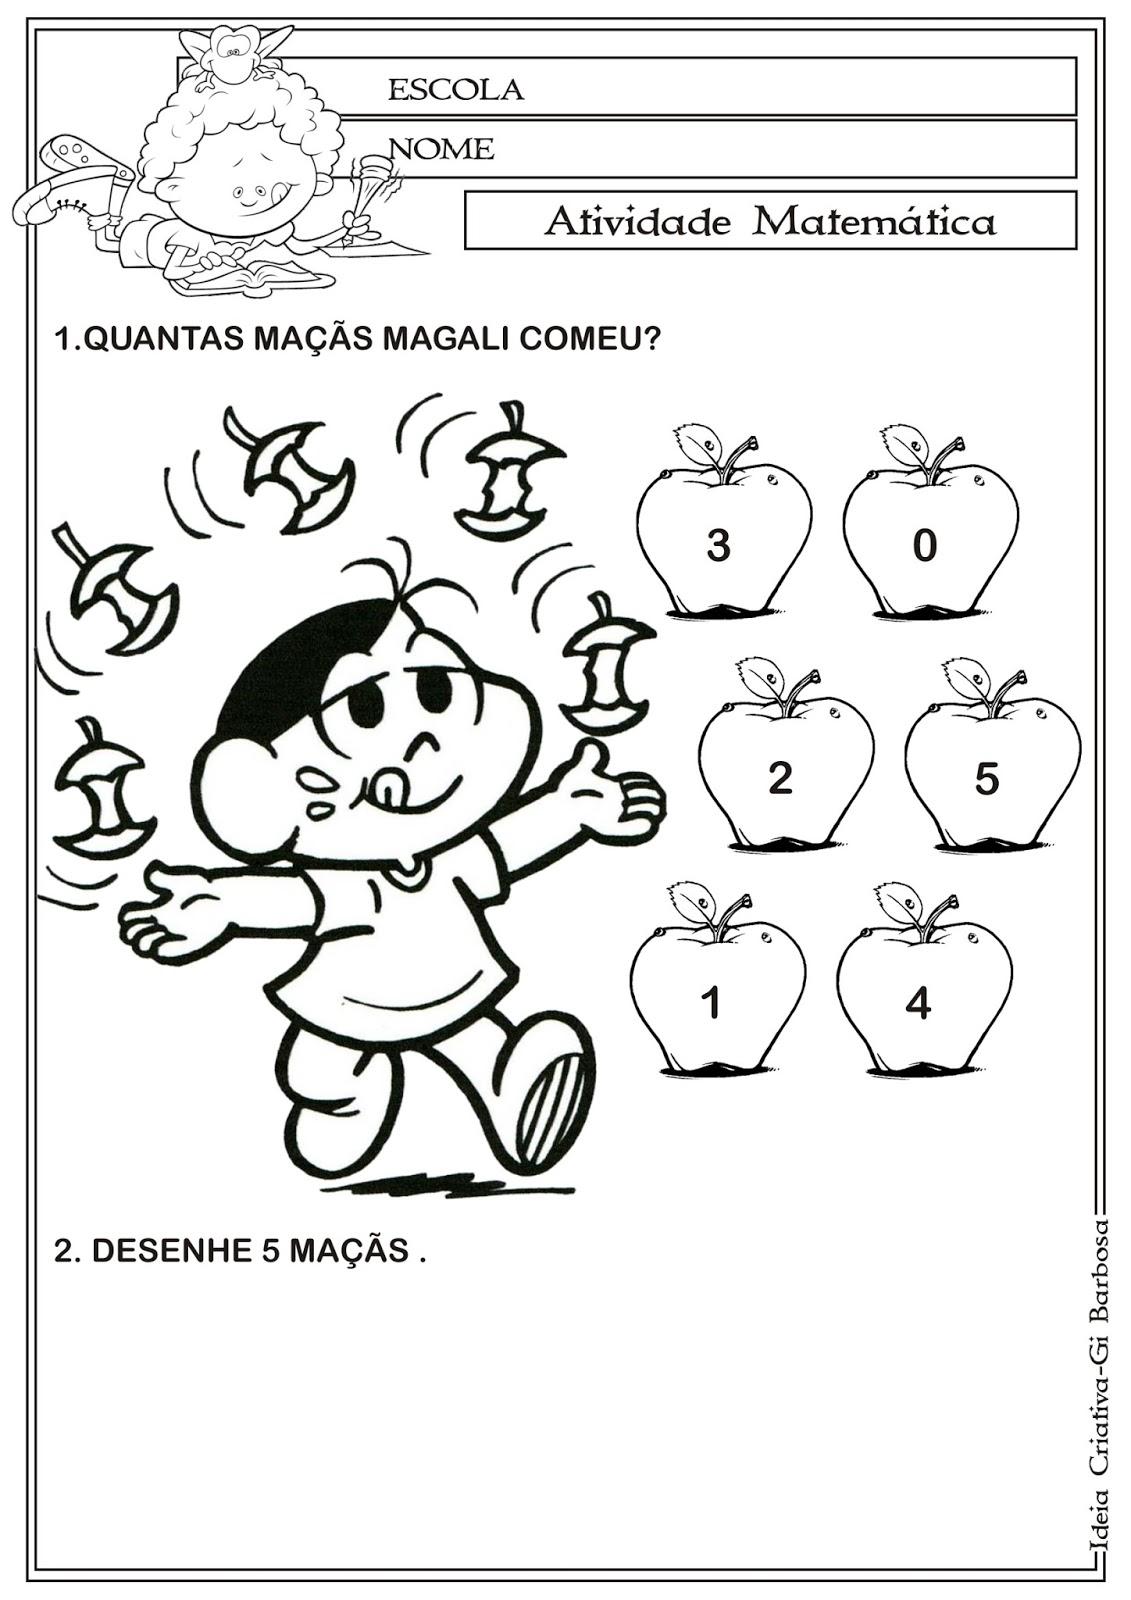 Matematica Infantil Atividade Matematica